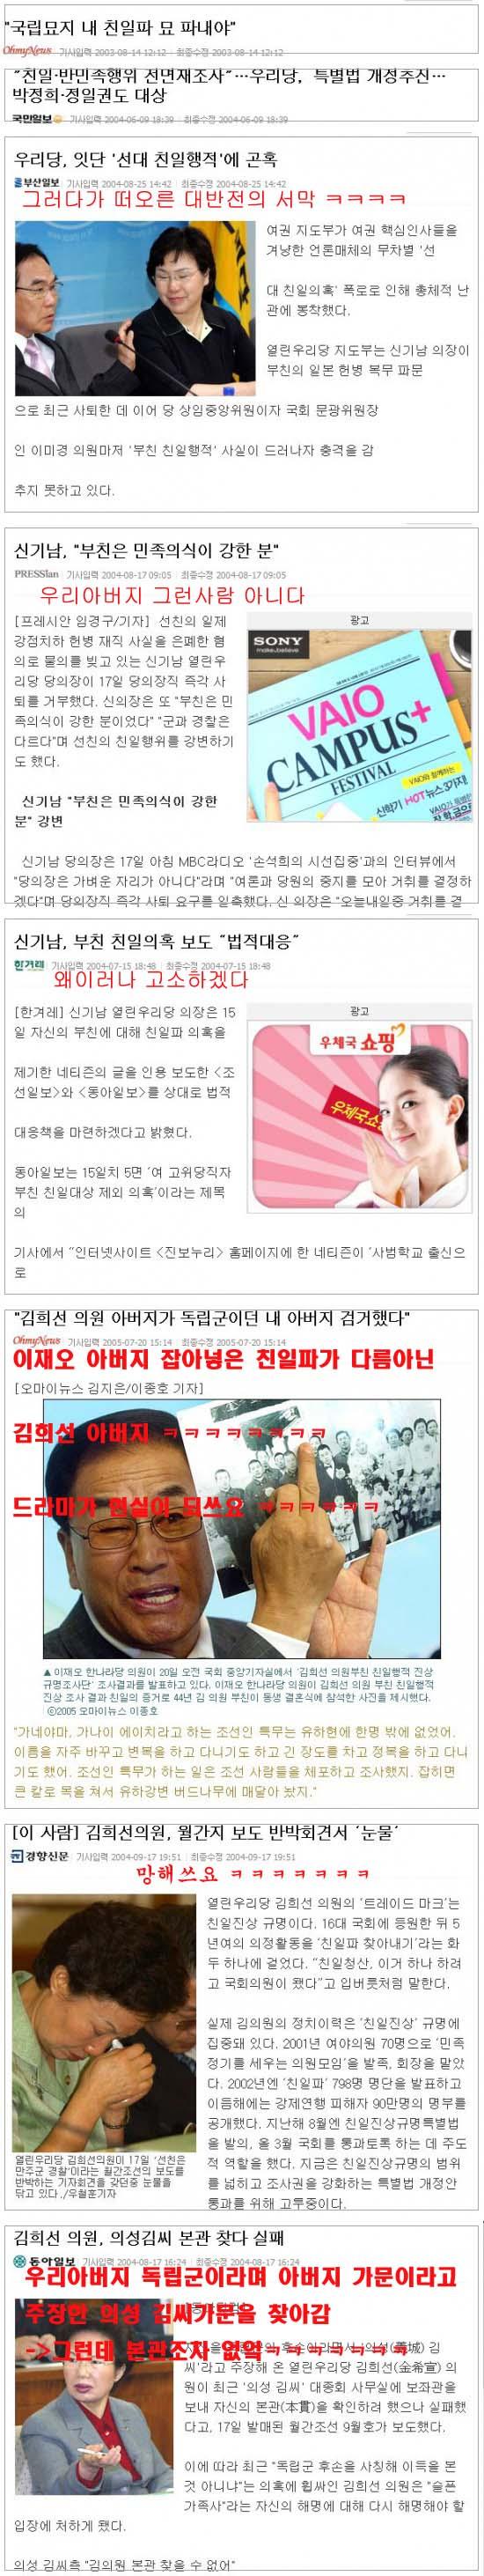 2.jpg 대한민국 그 유명한 친일대첩.JPG